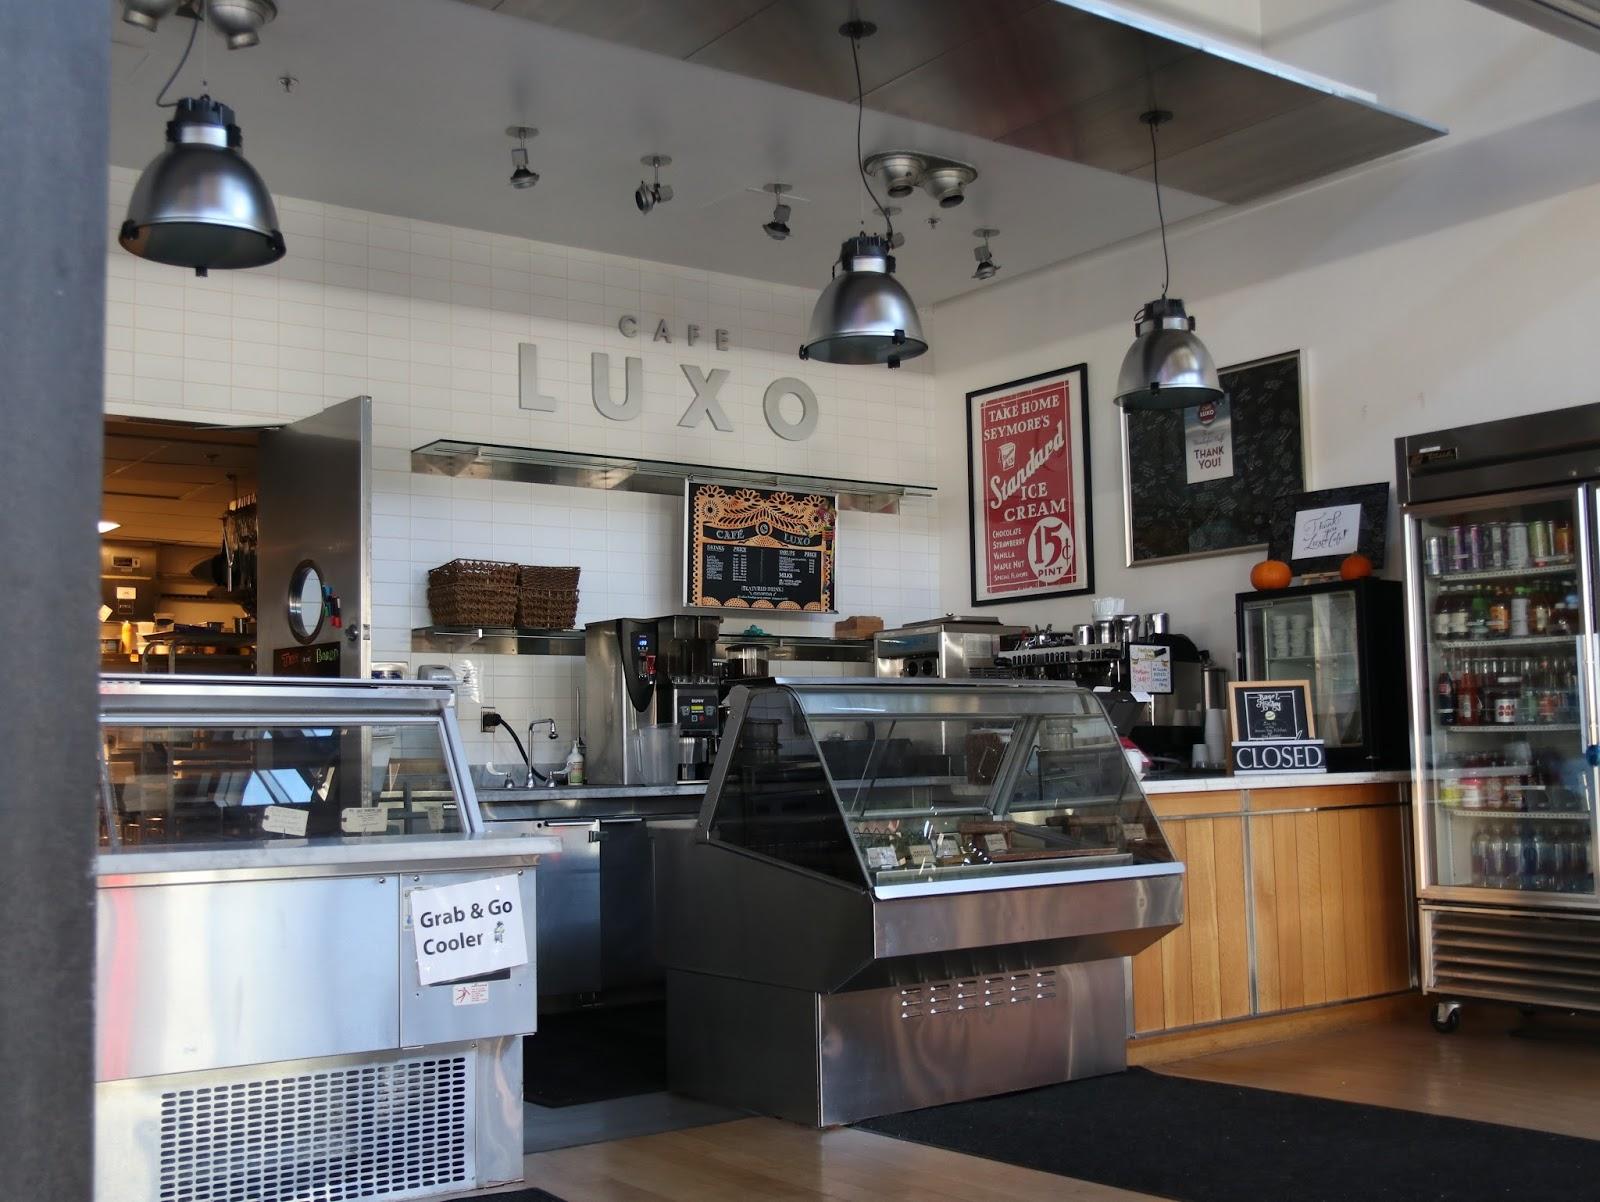 pixar studios cafe luxo